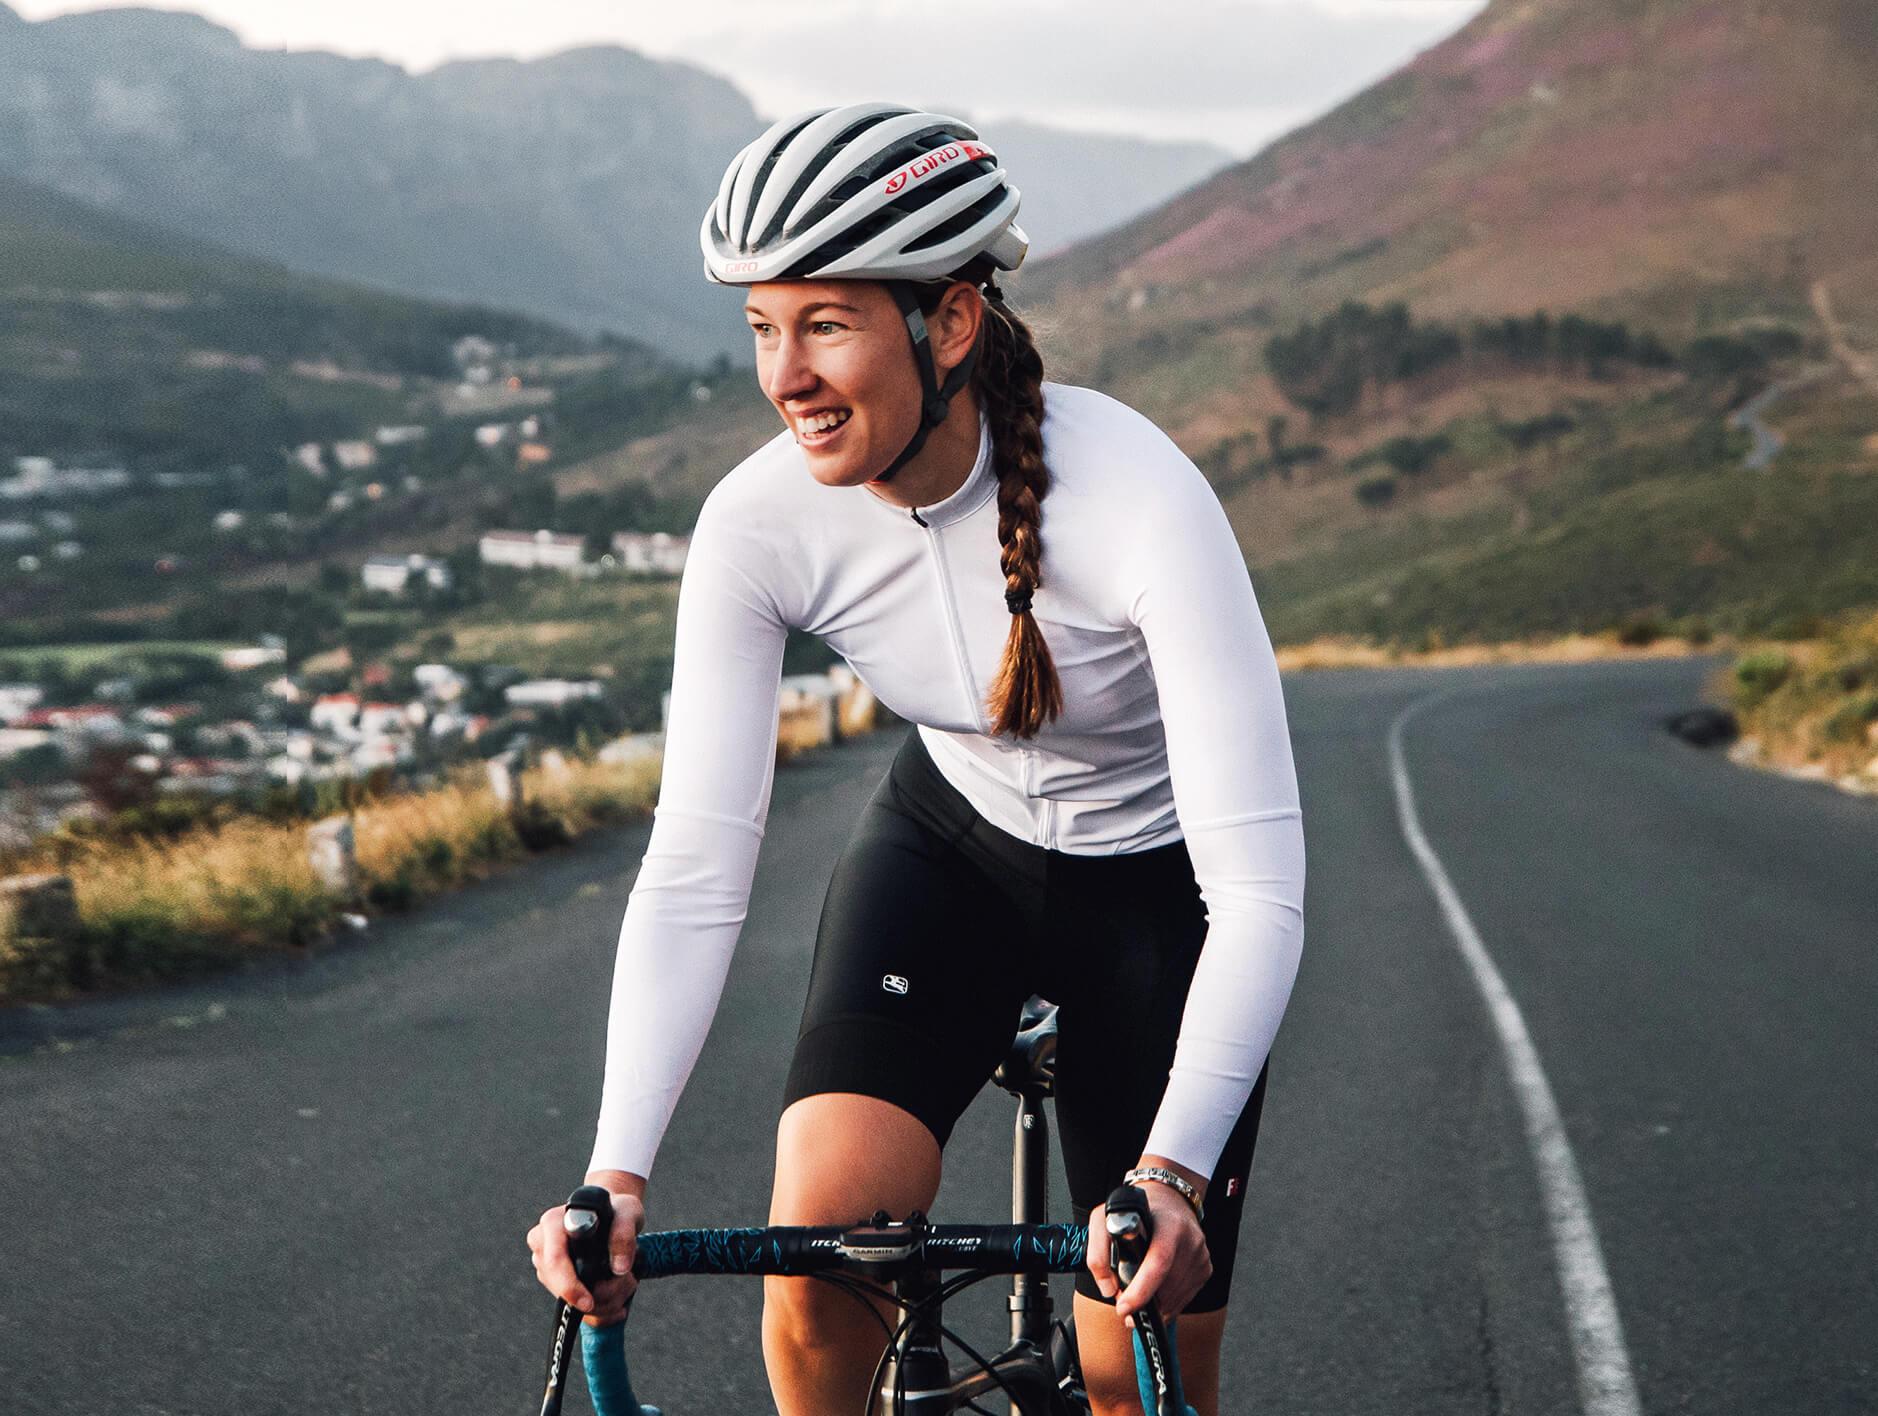 giordana-cycling-jersey-guide-fr-c-long-sleeve-women-large-1-new